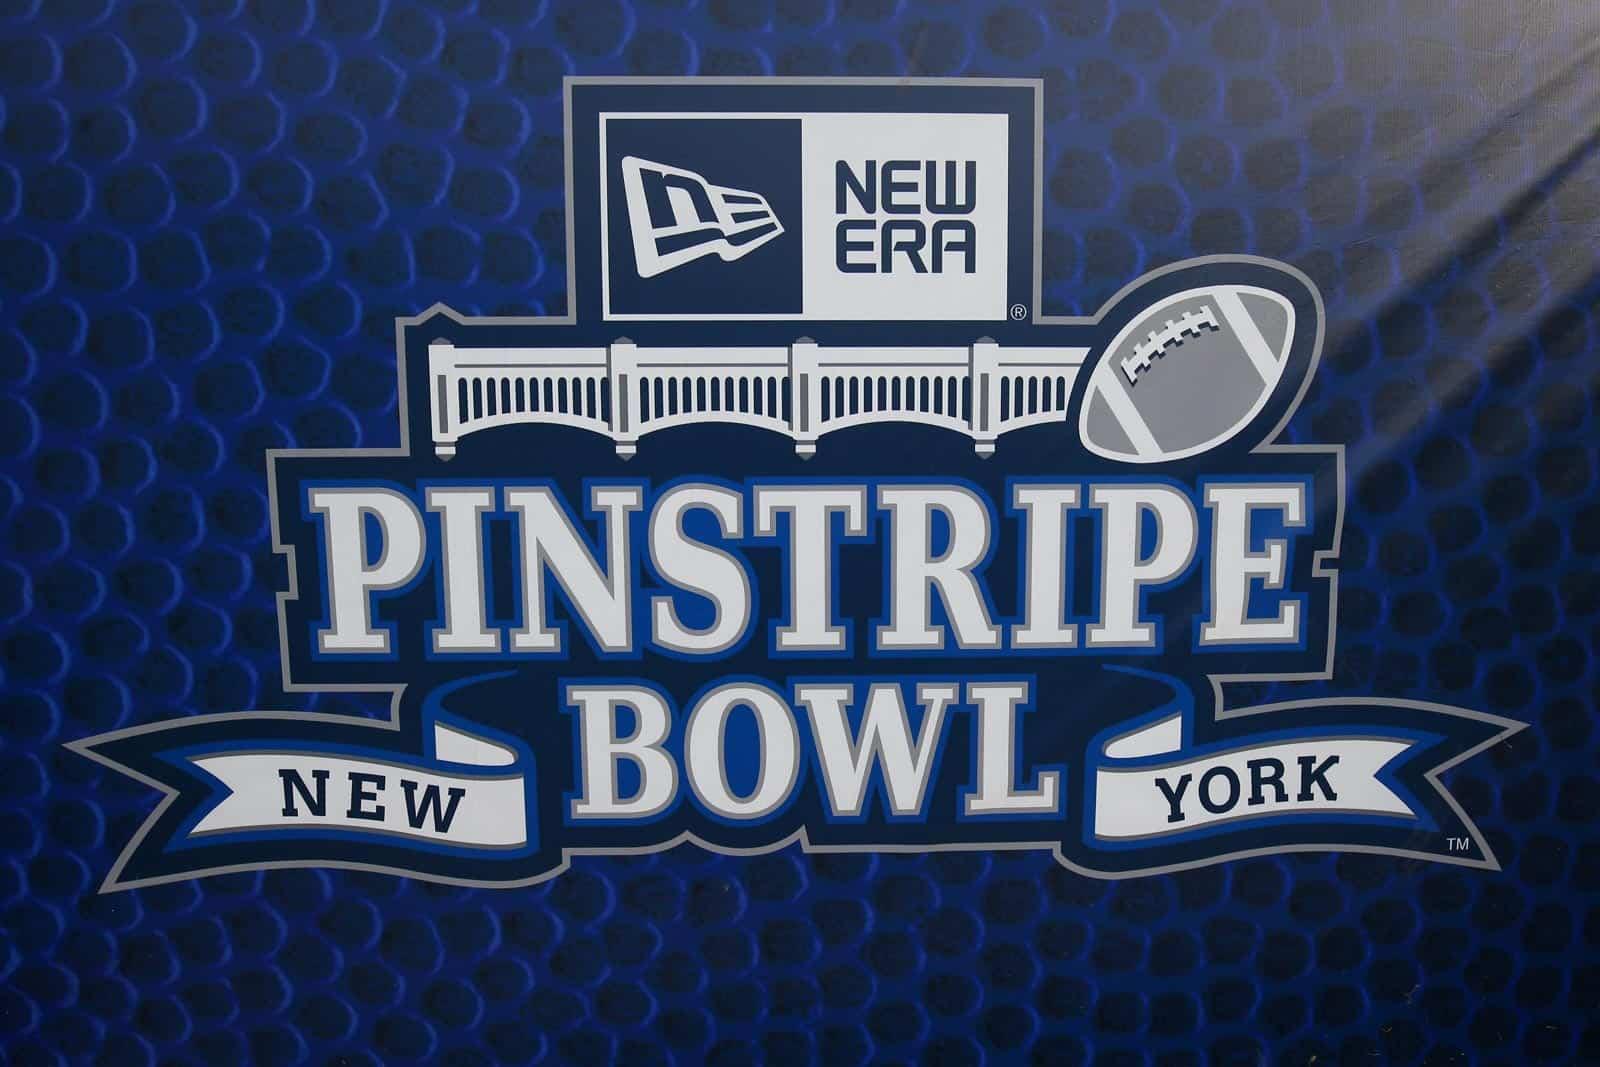 New Era Pinstripe Bowl